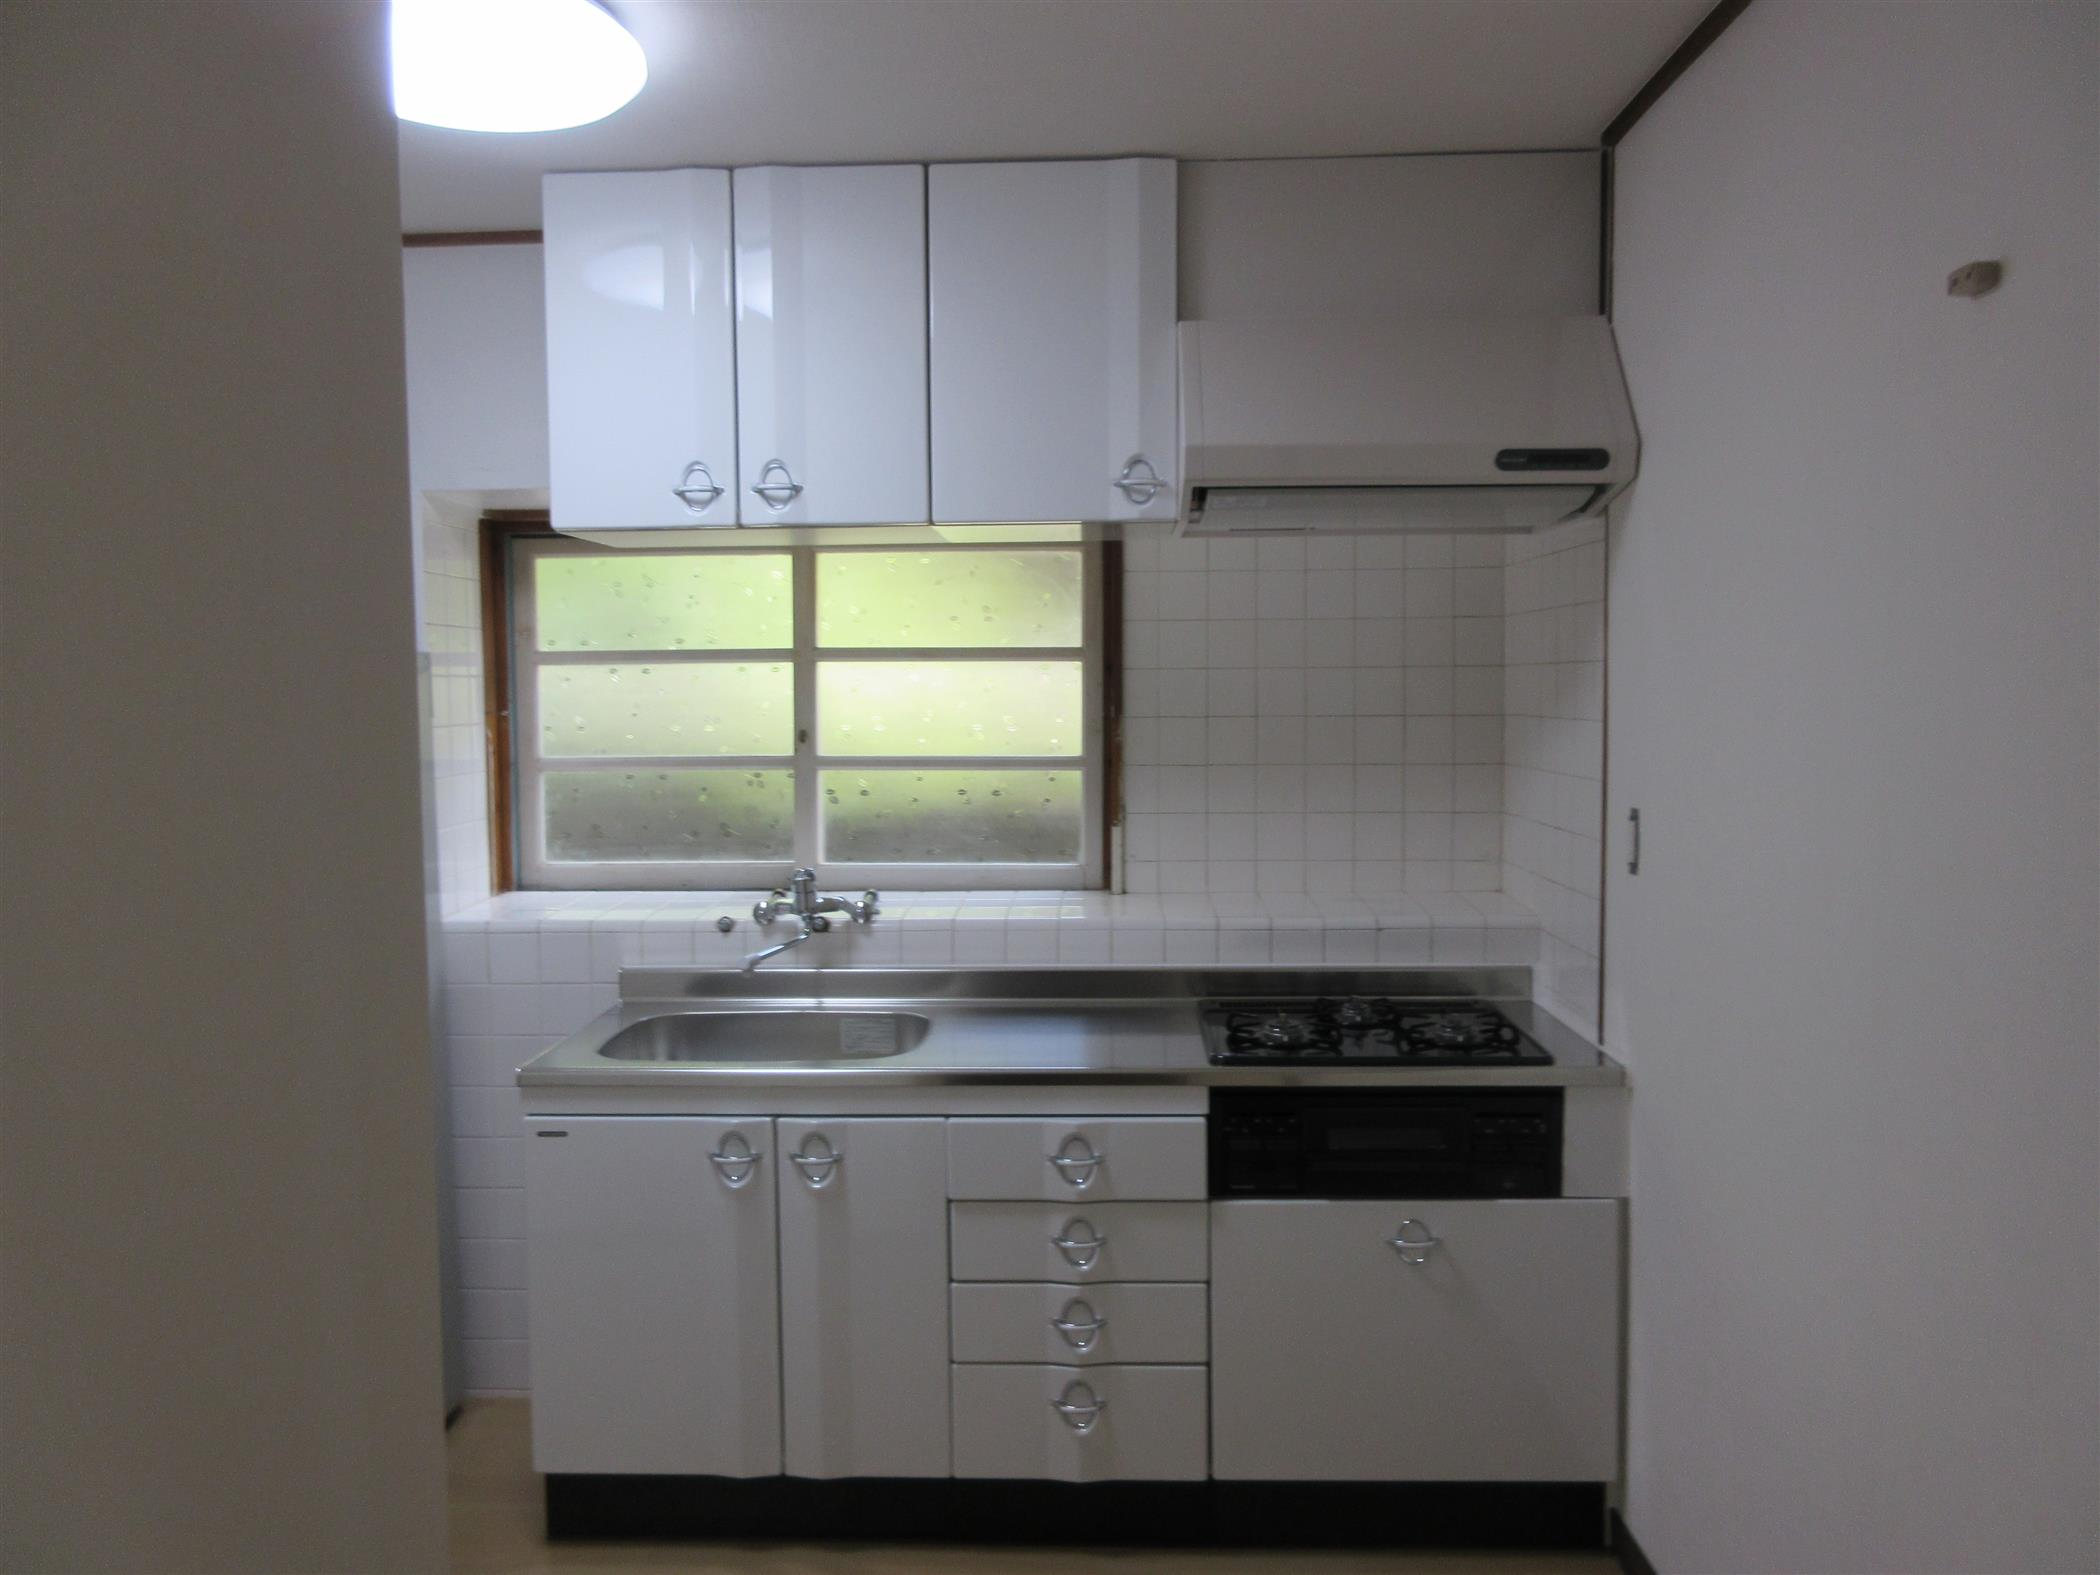 M邸改装工事(リフォーム施工事例)を公開しました。 | 沖縄や那覇でリフォームするなら【株式会社 あうん工房】